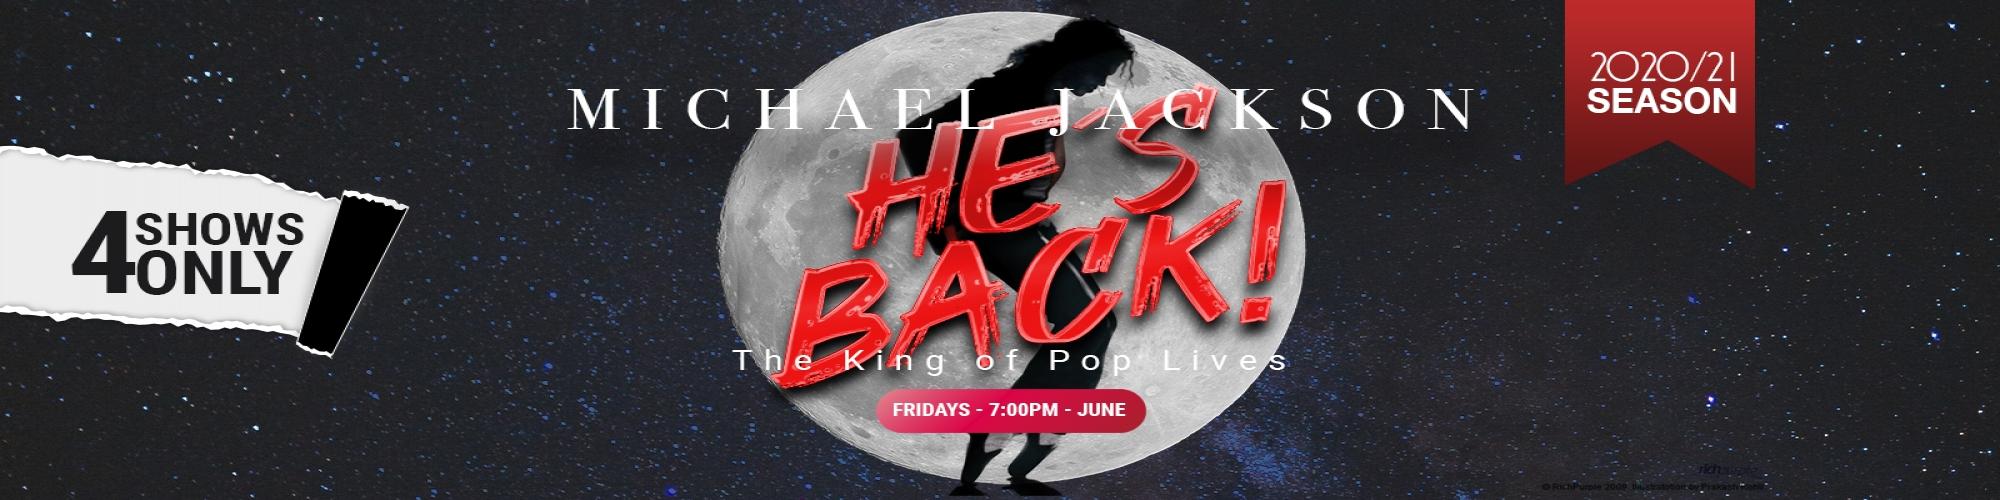 MICHAEL JACKSON:  HE'S BACK!